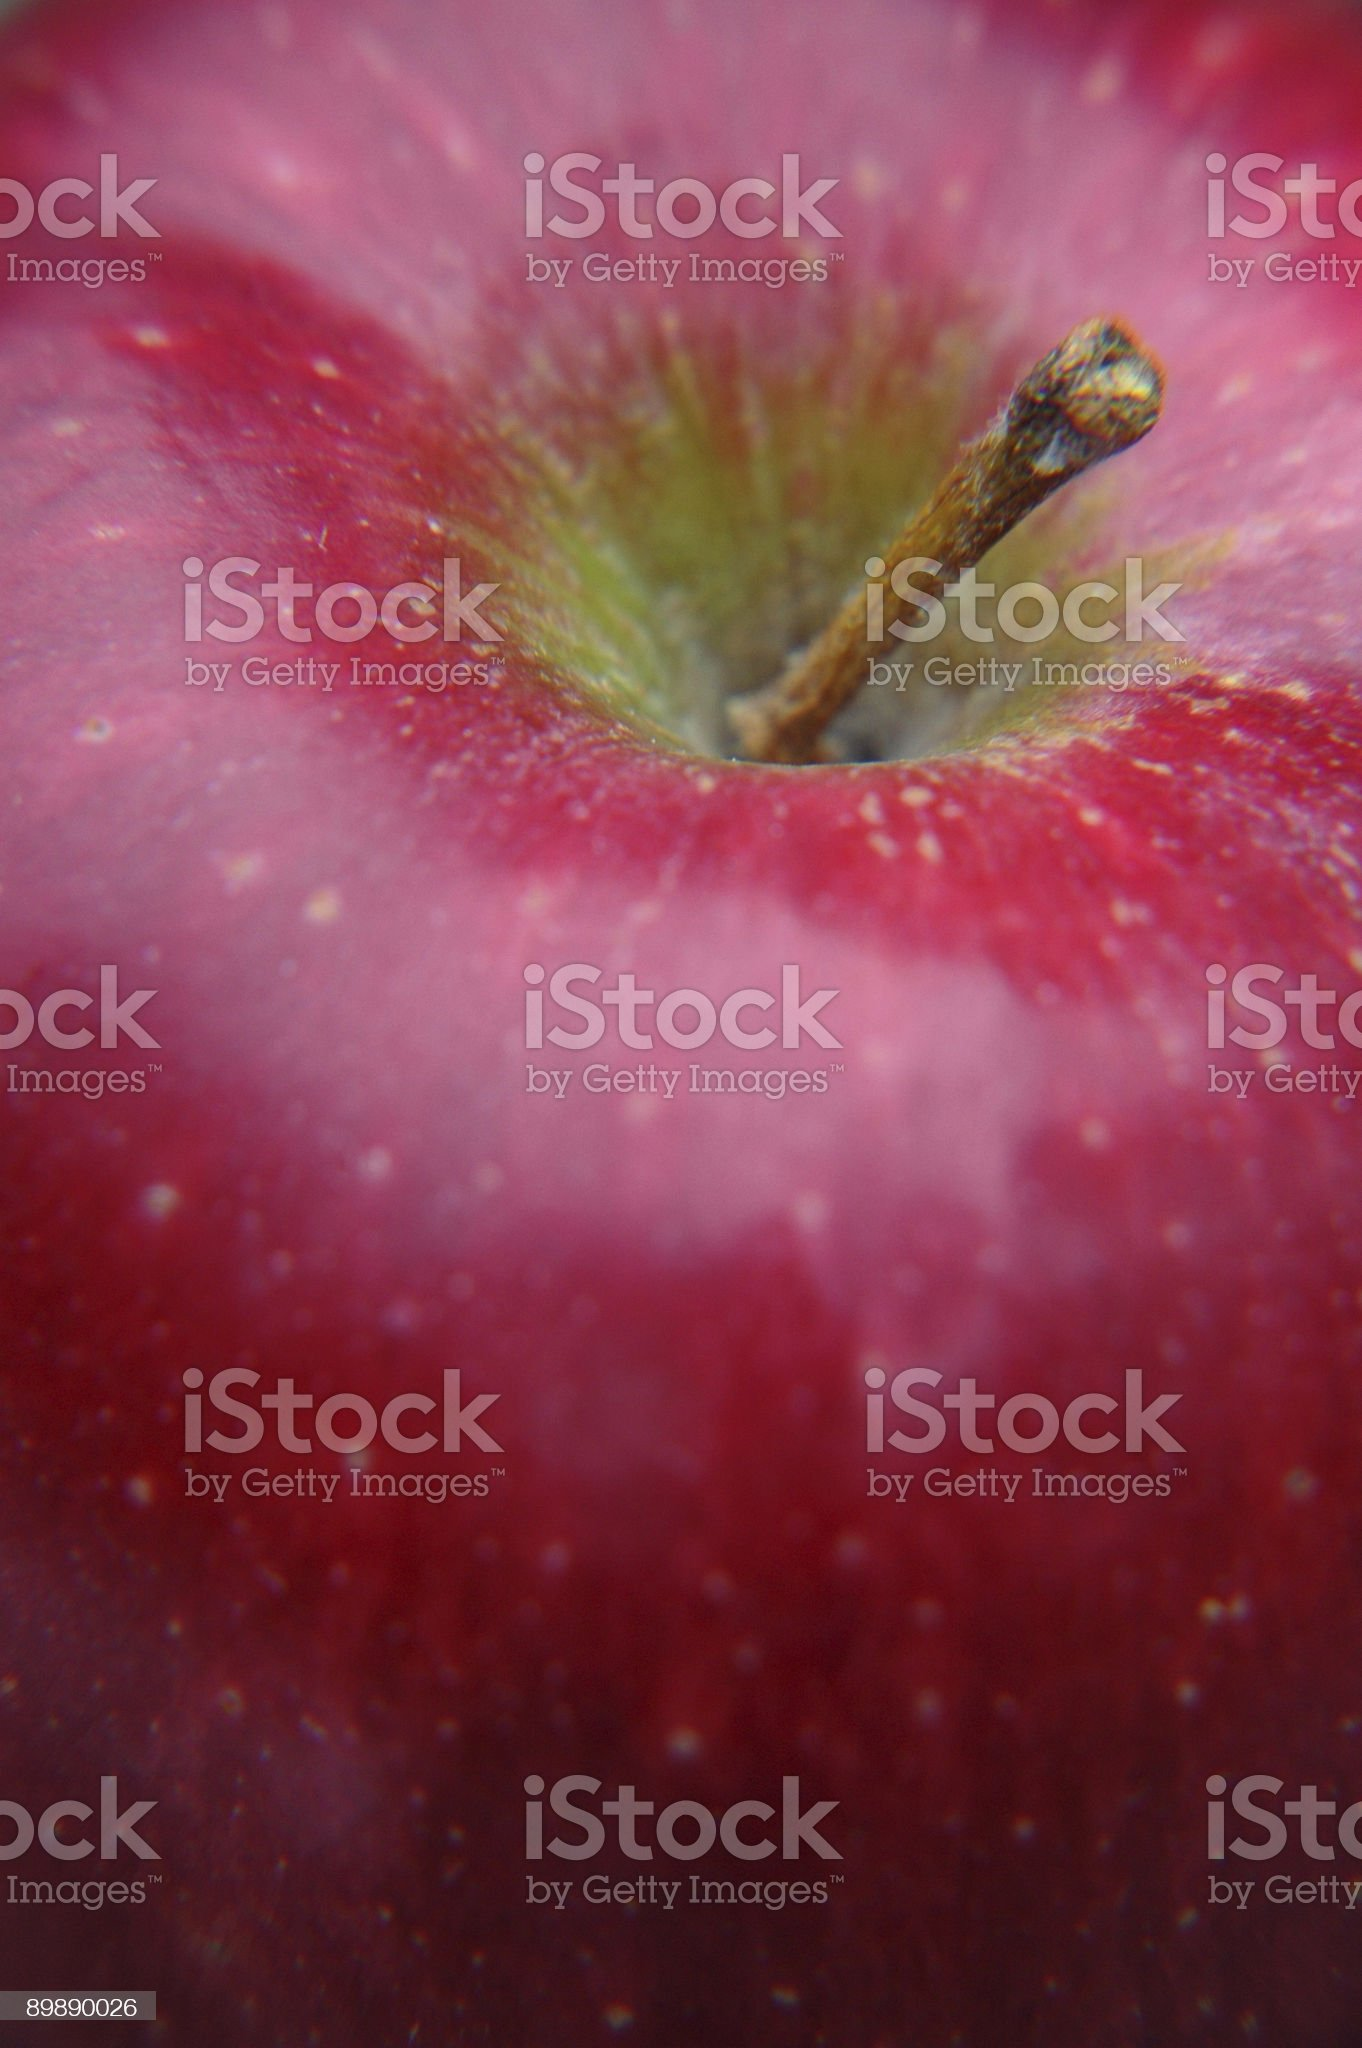 Apple Close-up royalty-free stock photo